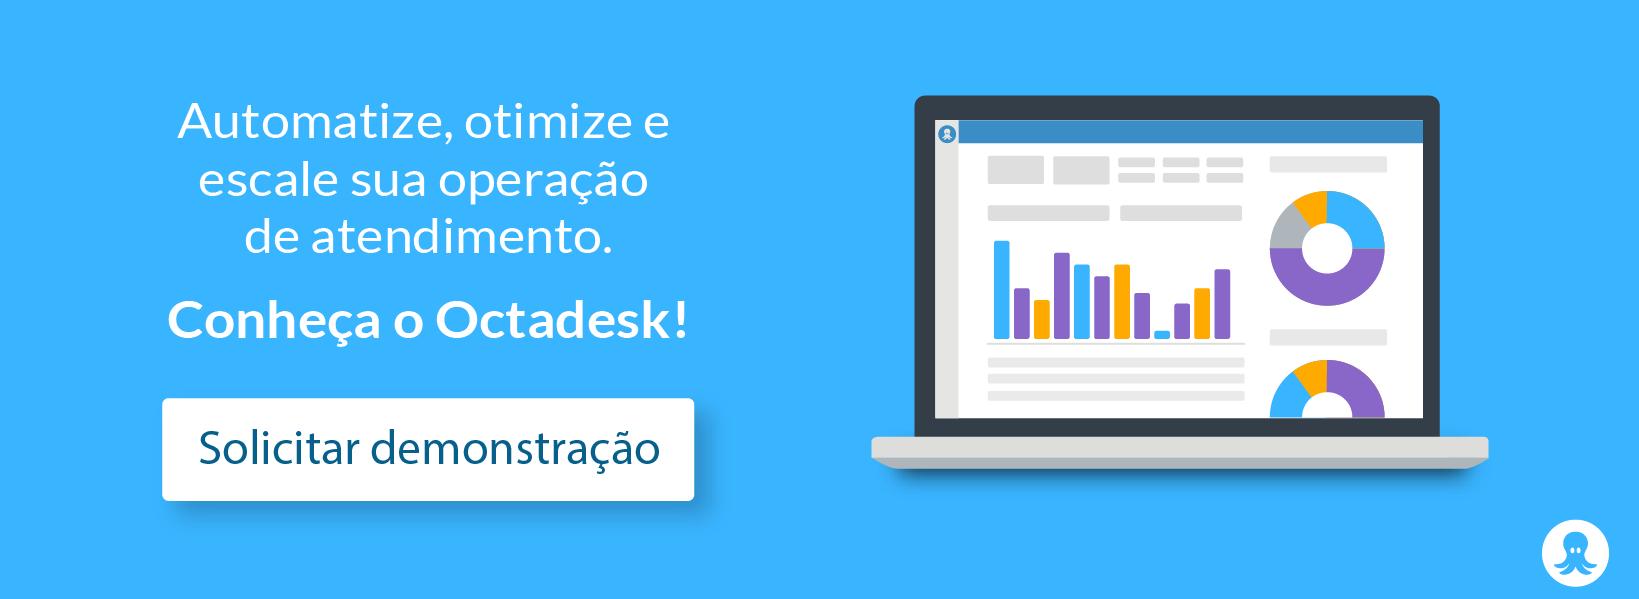 chatbot octadesk